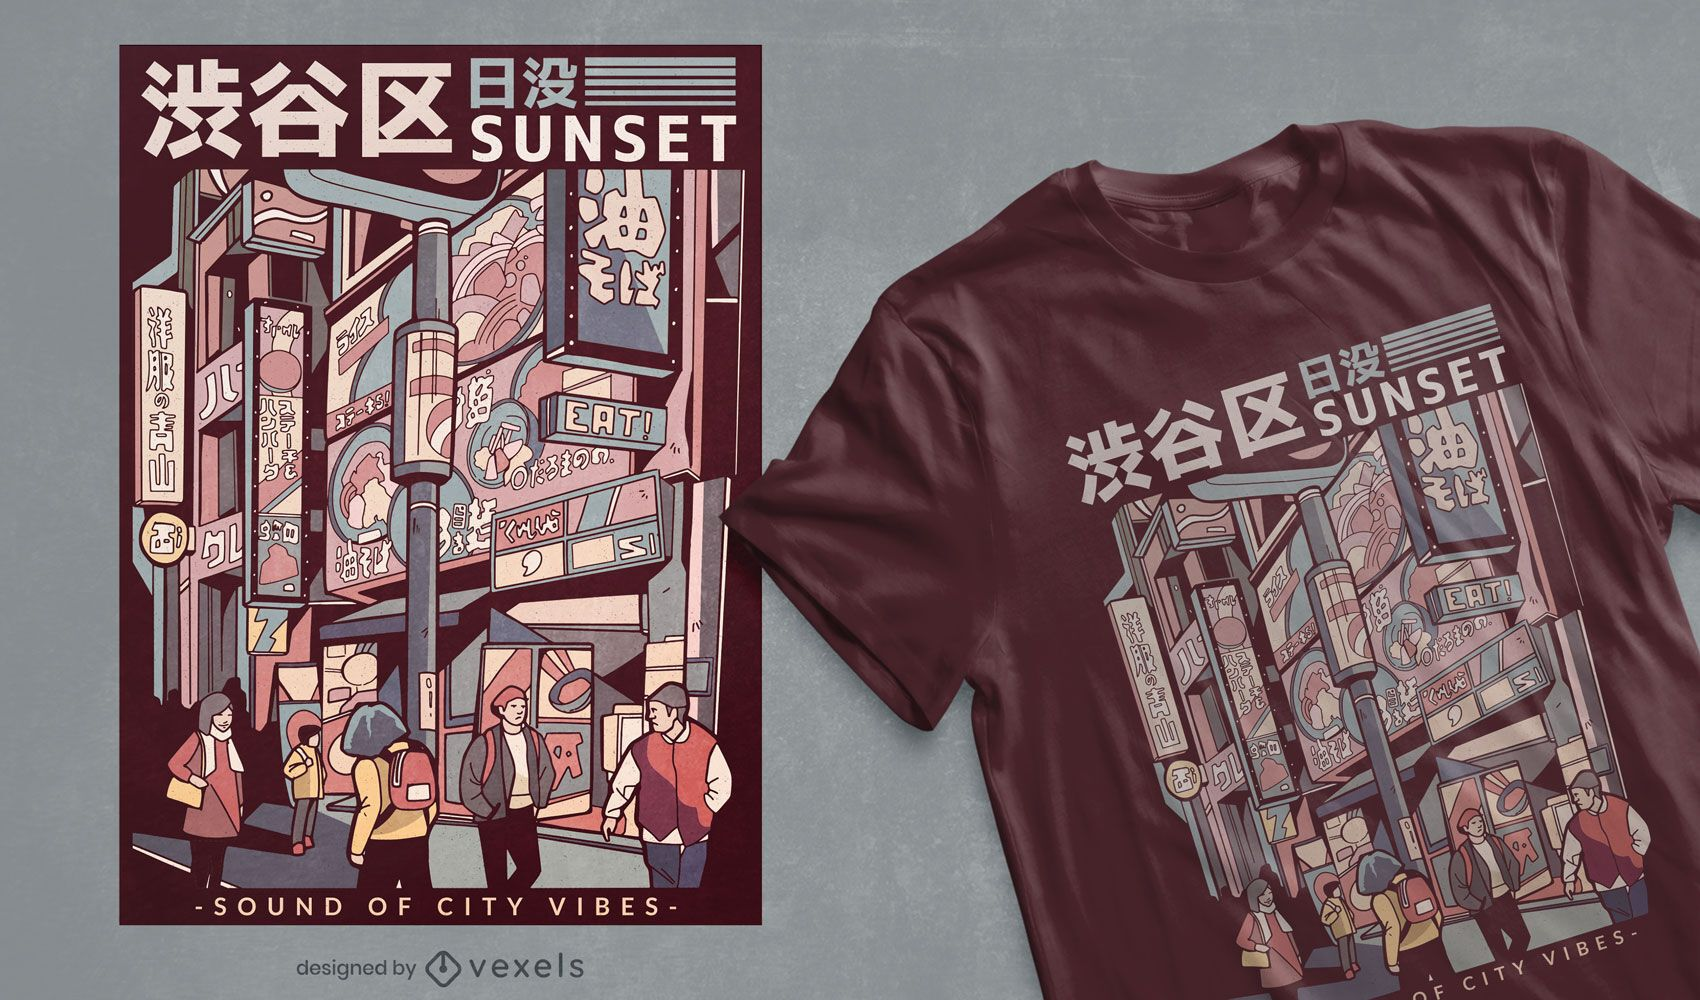 Japanese street t-shirt design